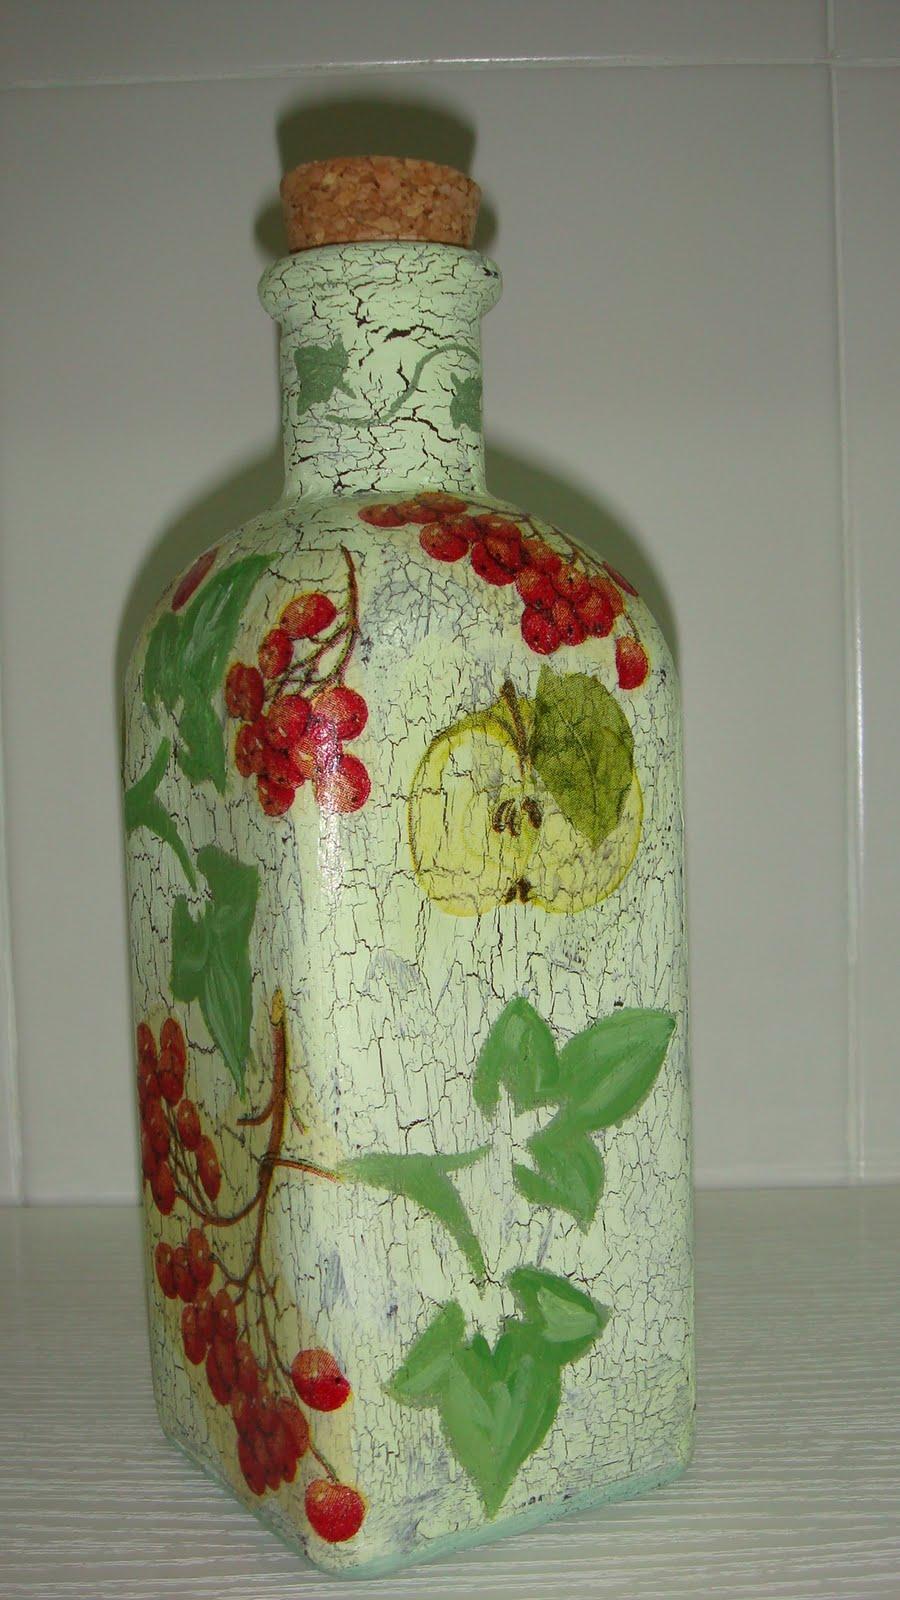 Manualidades mimos pilar vicente del barrio botellas decoradas - Botellas decoradas manualidades ...